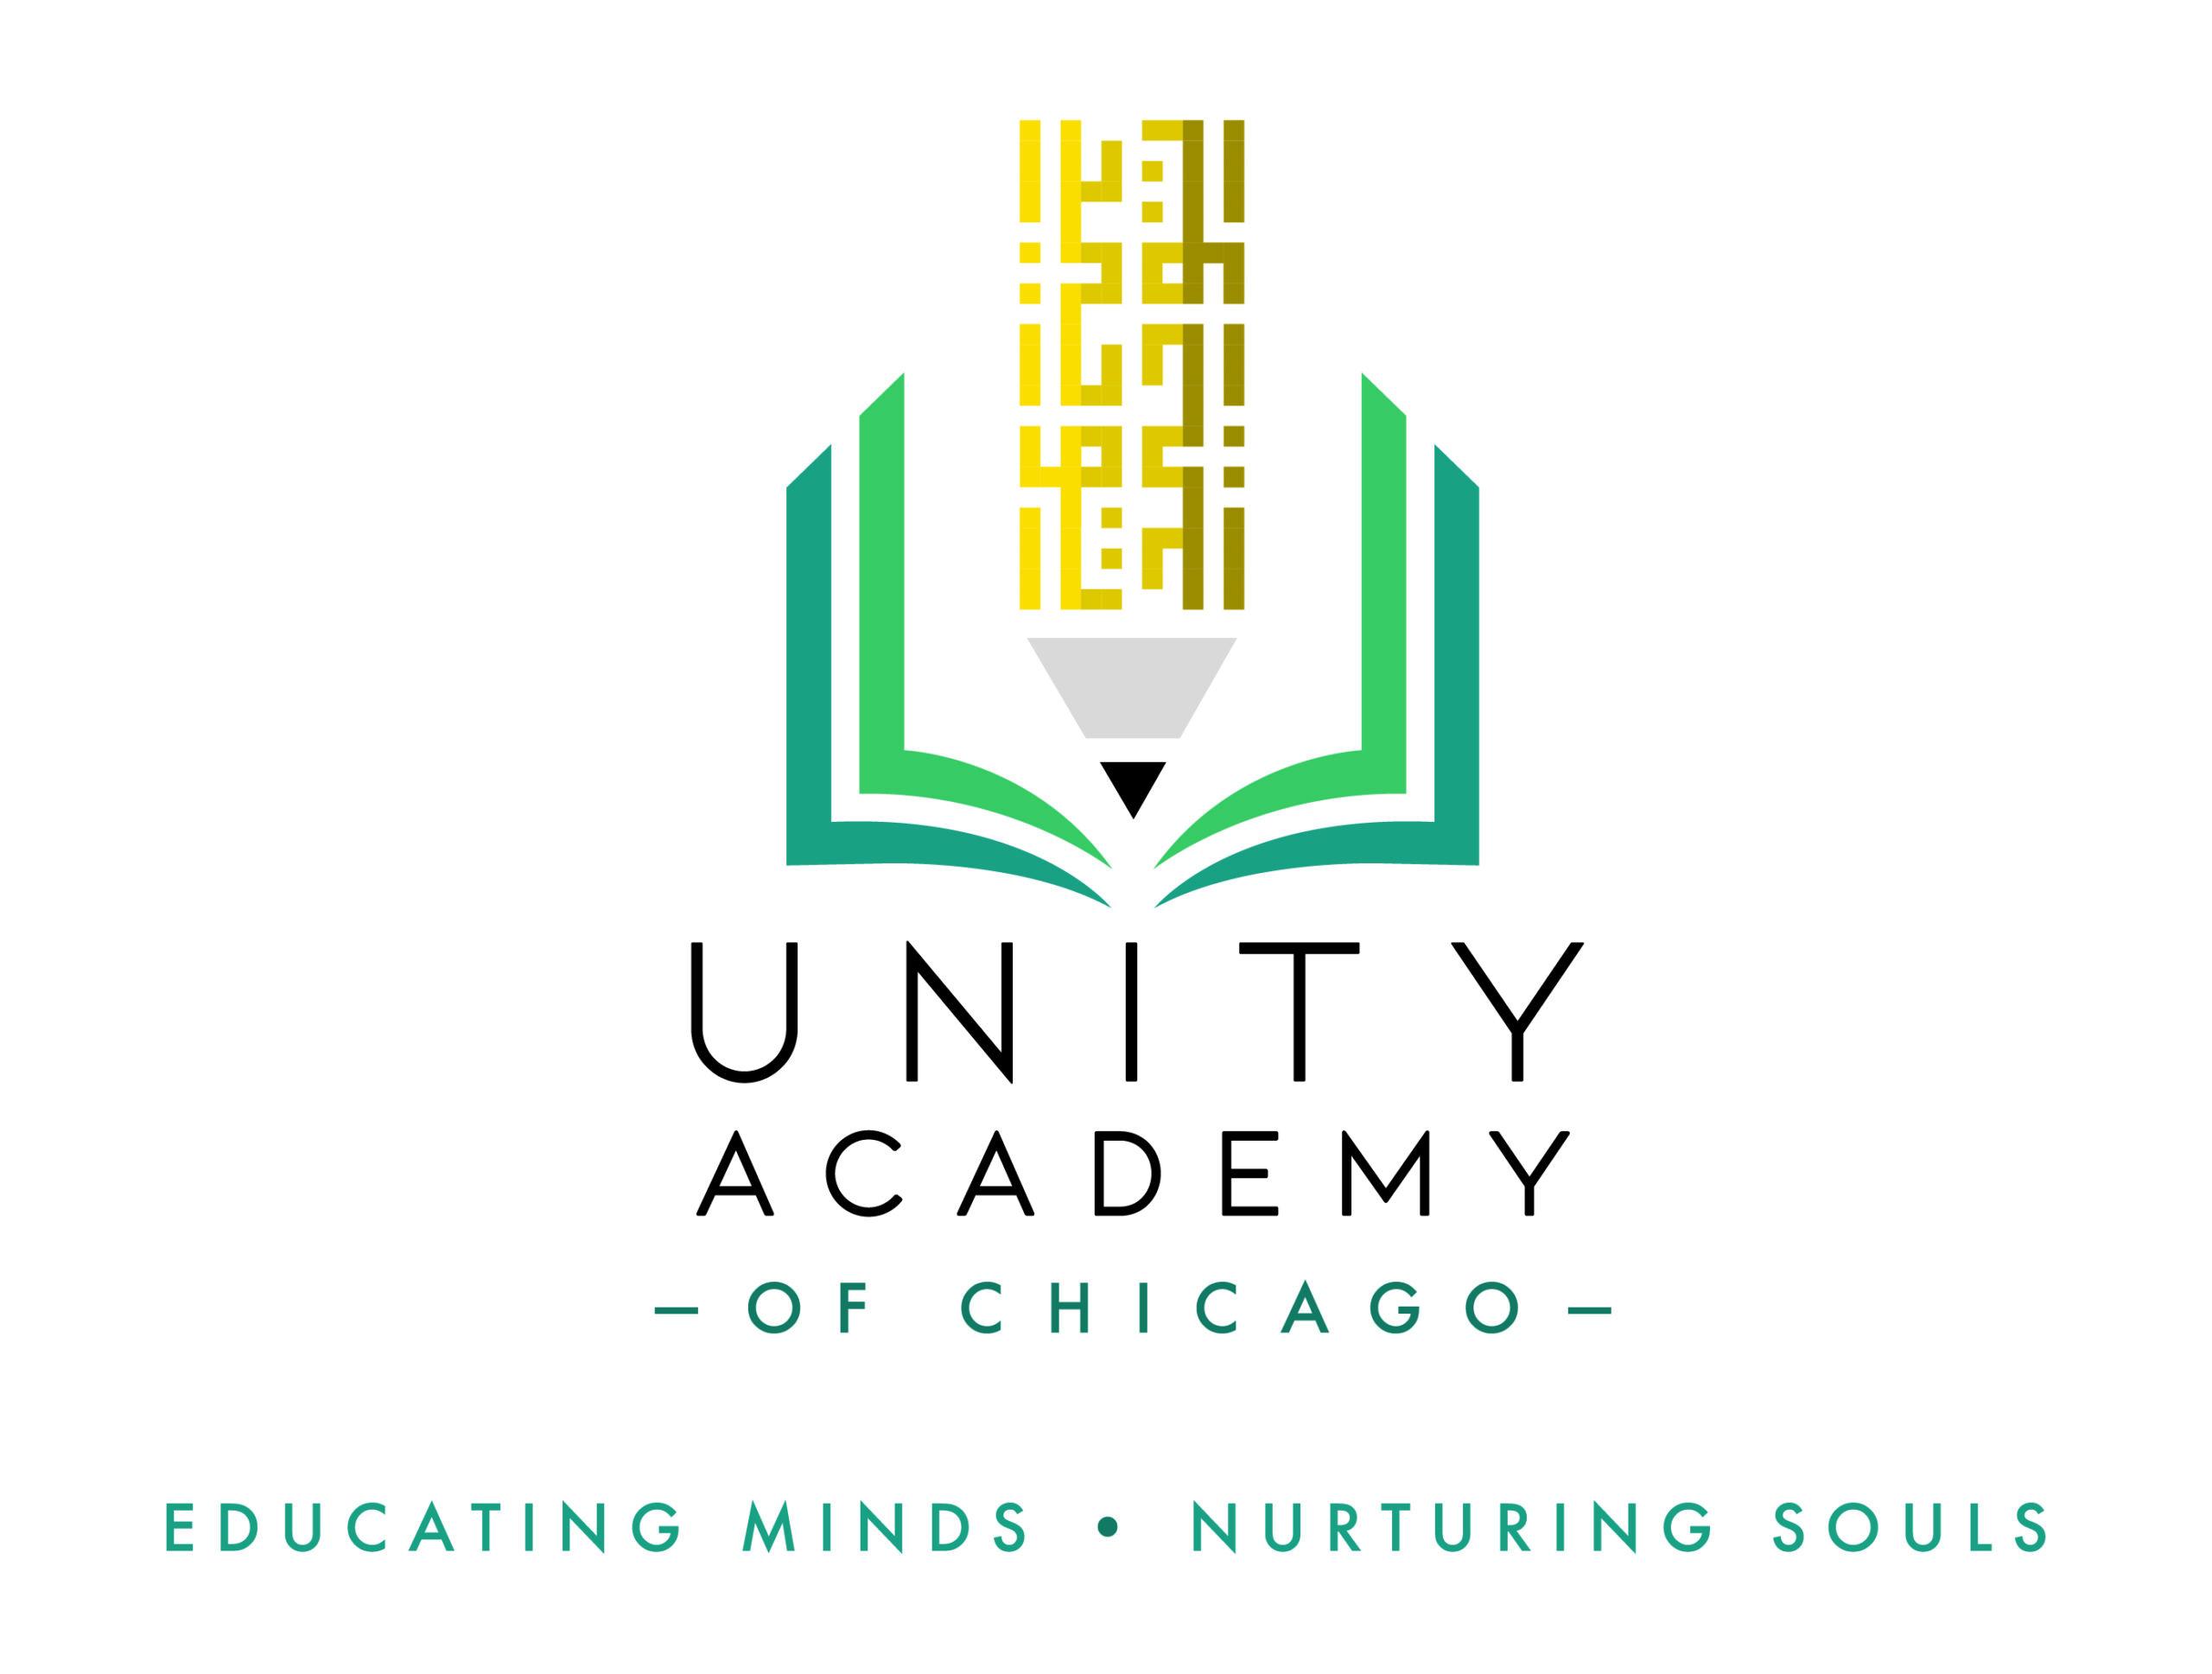 Unity Academy of Chicago